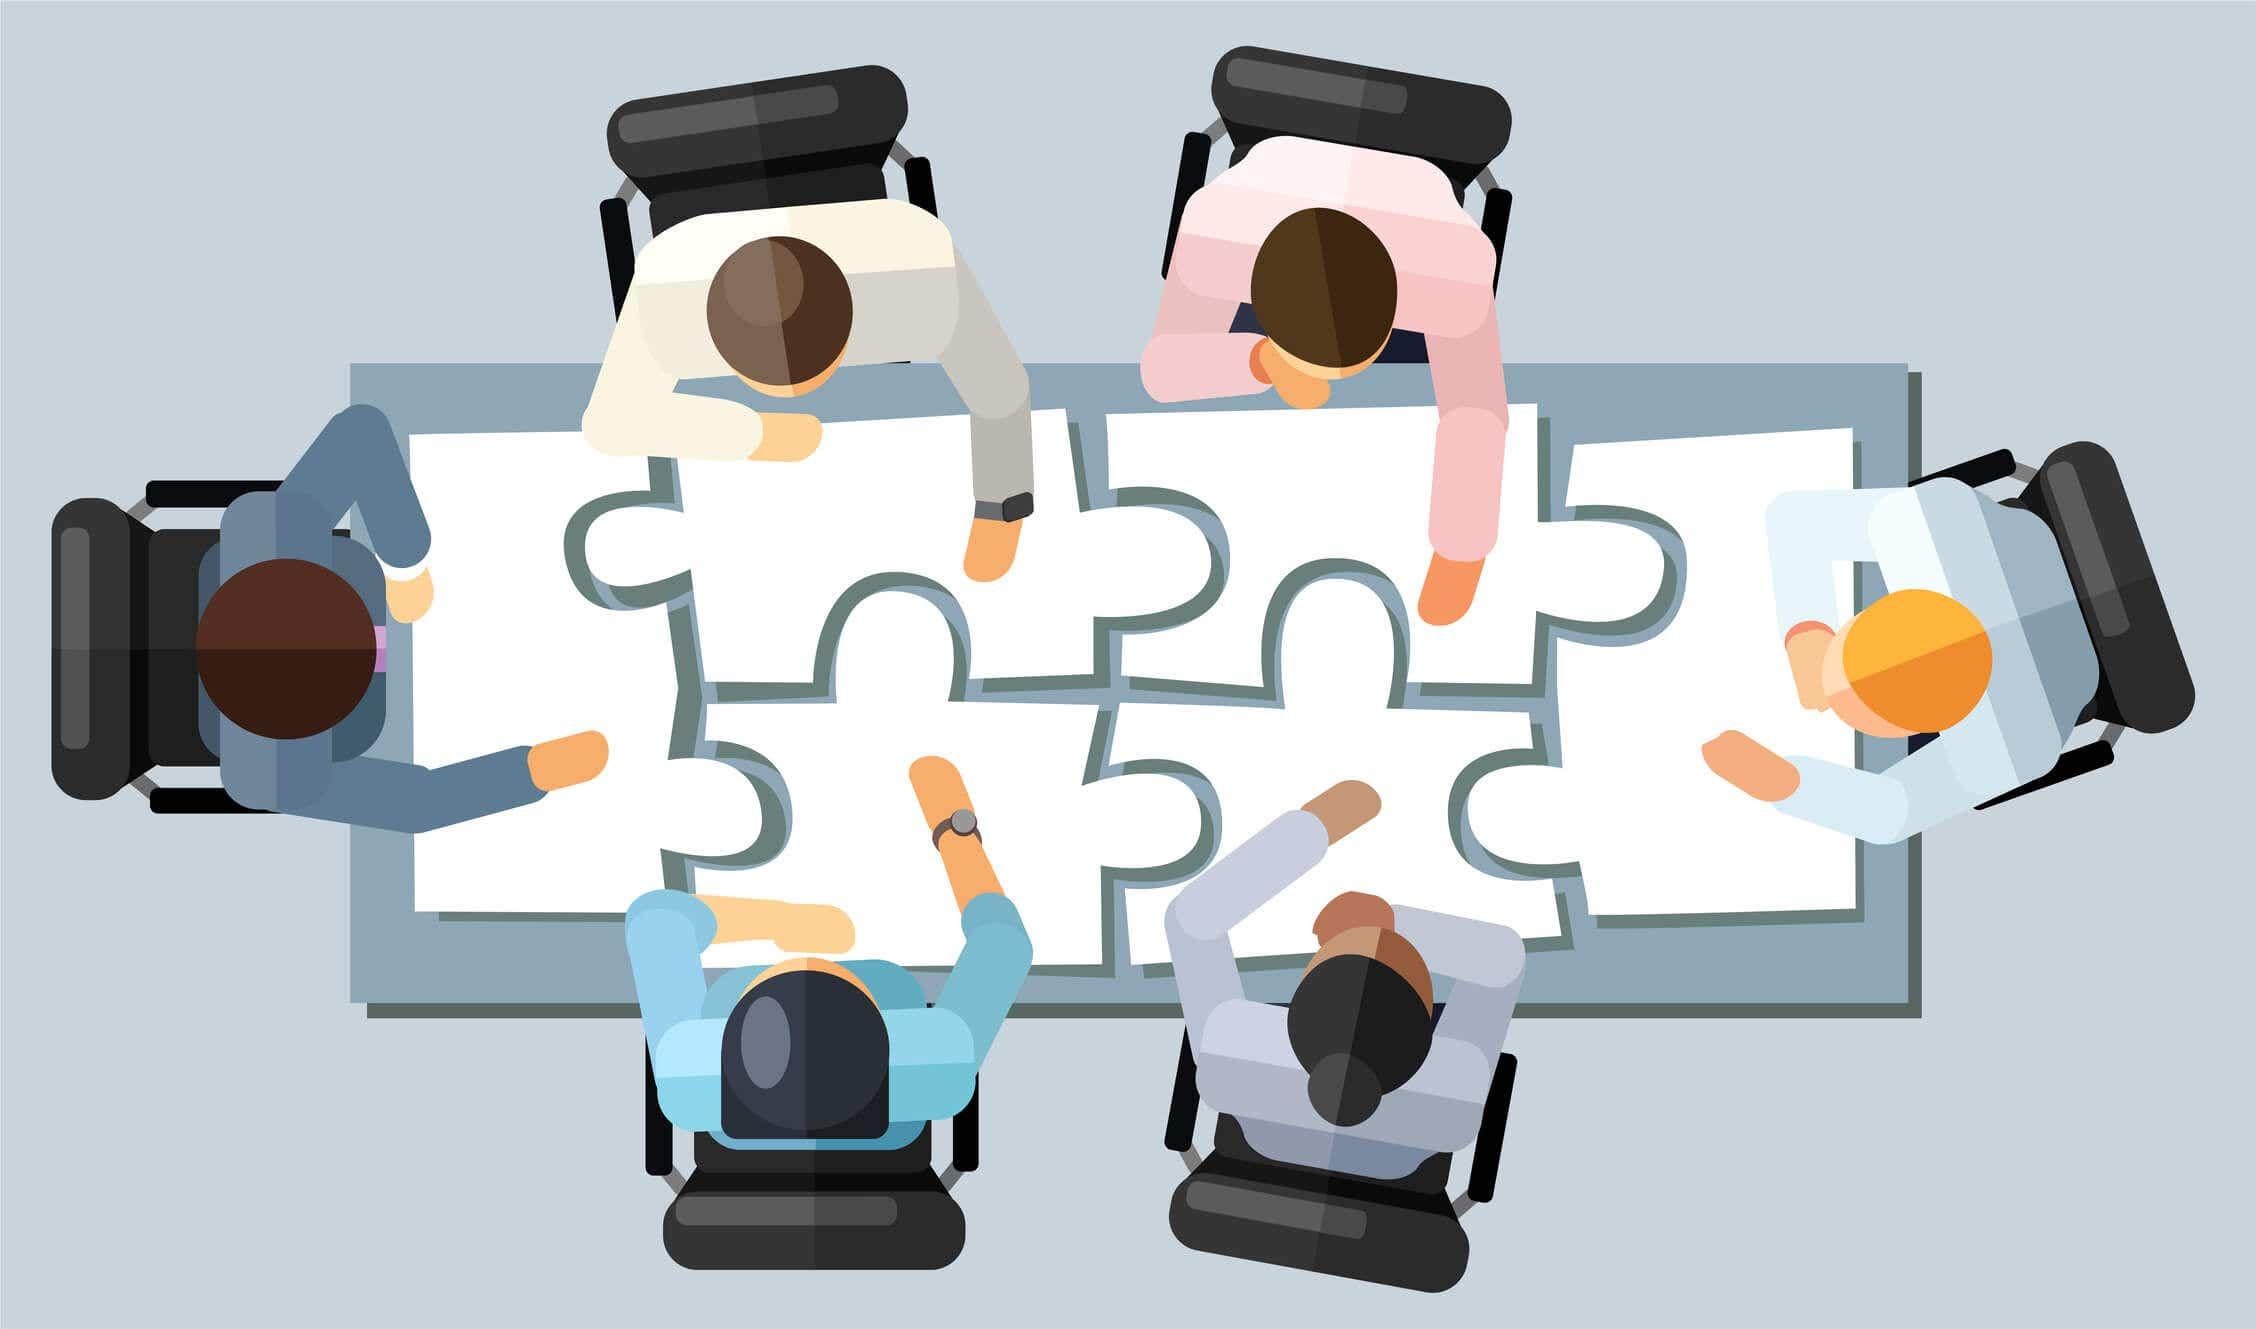 partnership advantage partners share debt burden